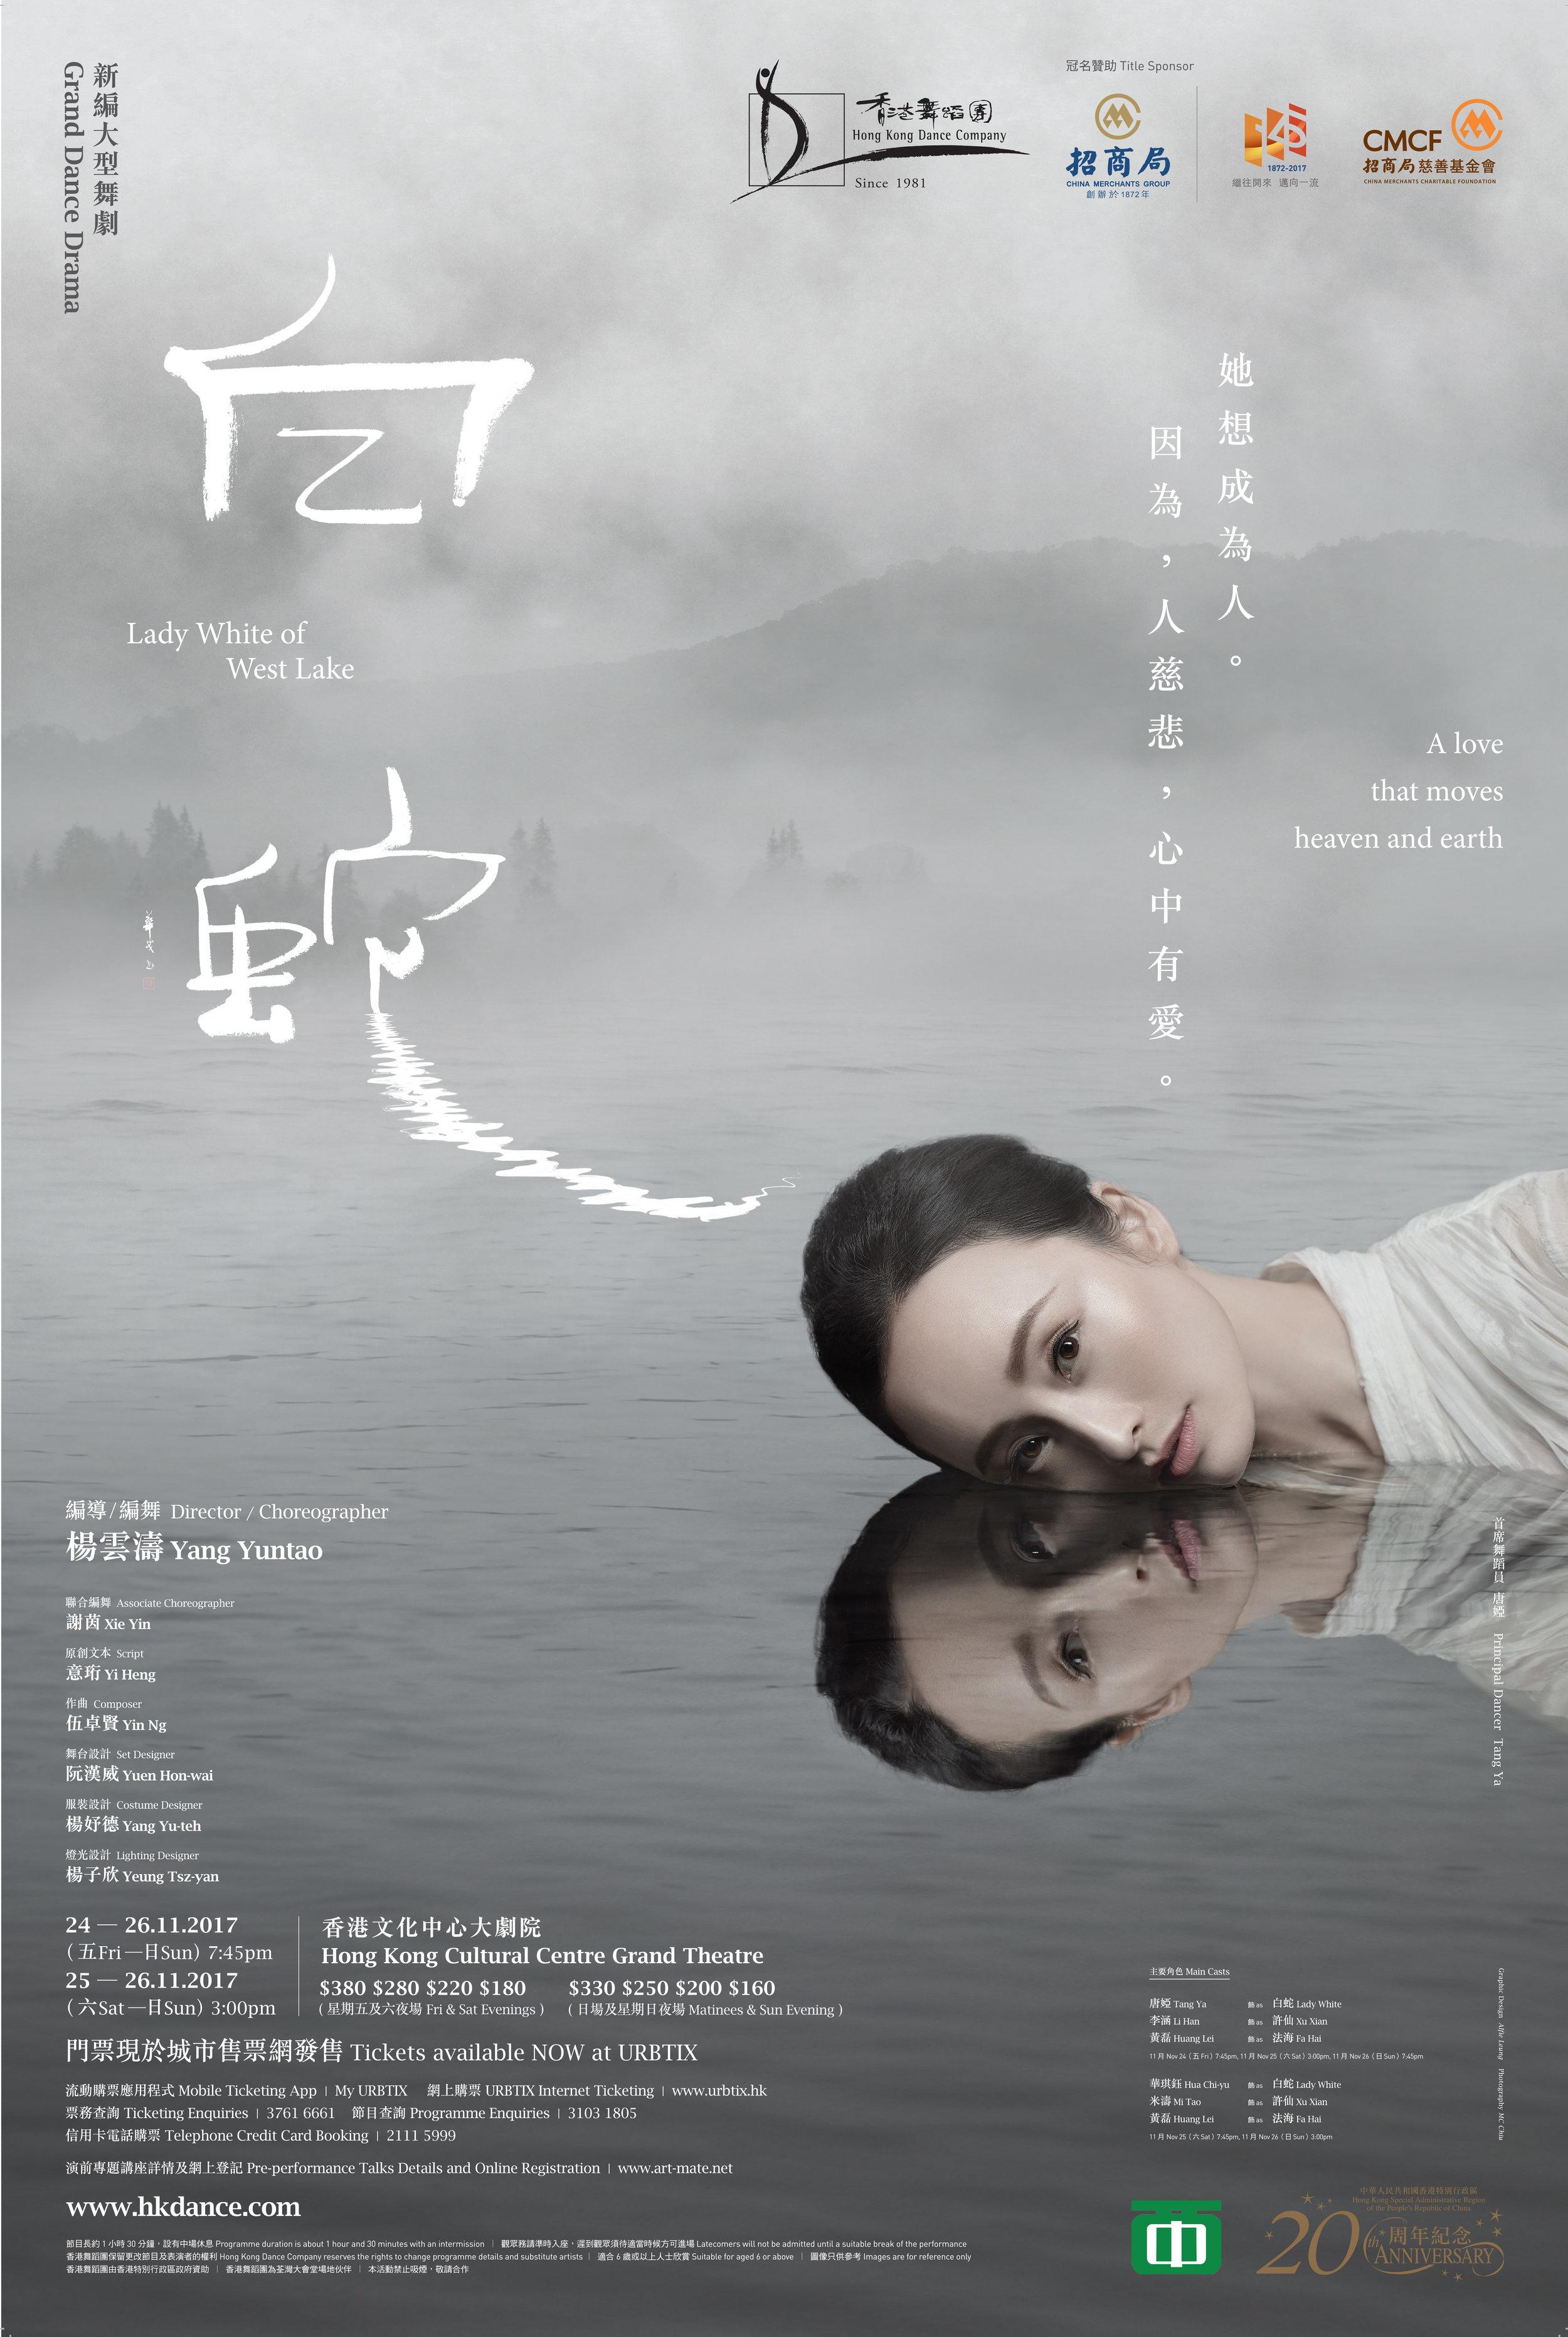 HK Dance 白蛇 (Lady White of West Lake) Poster. Hong Kong. 2017